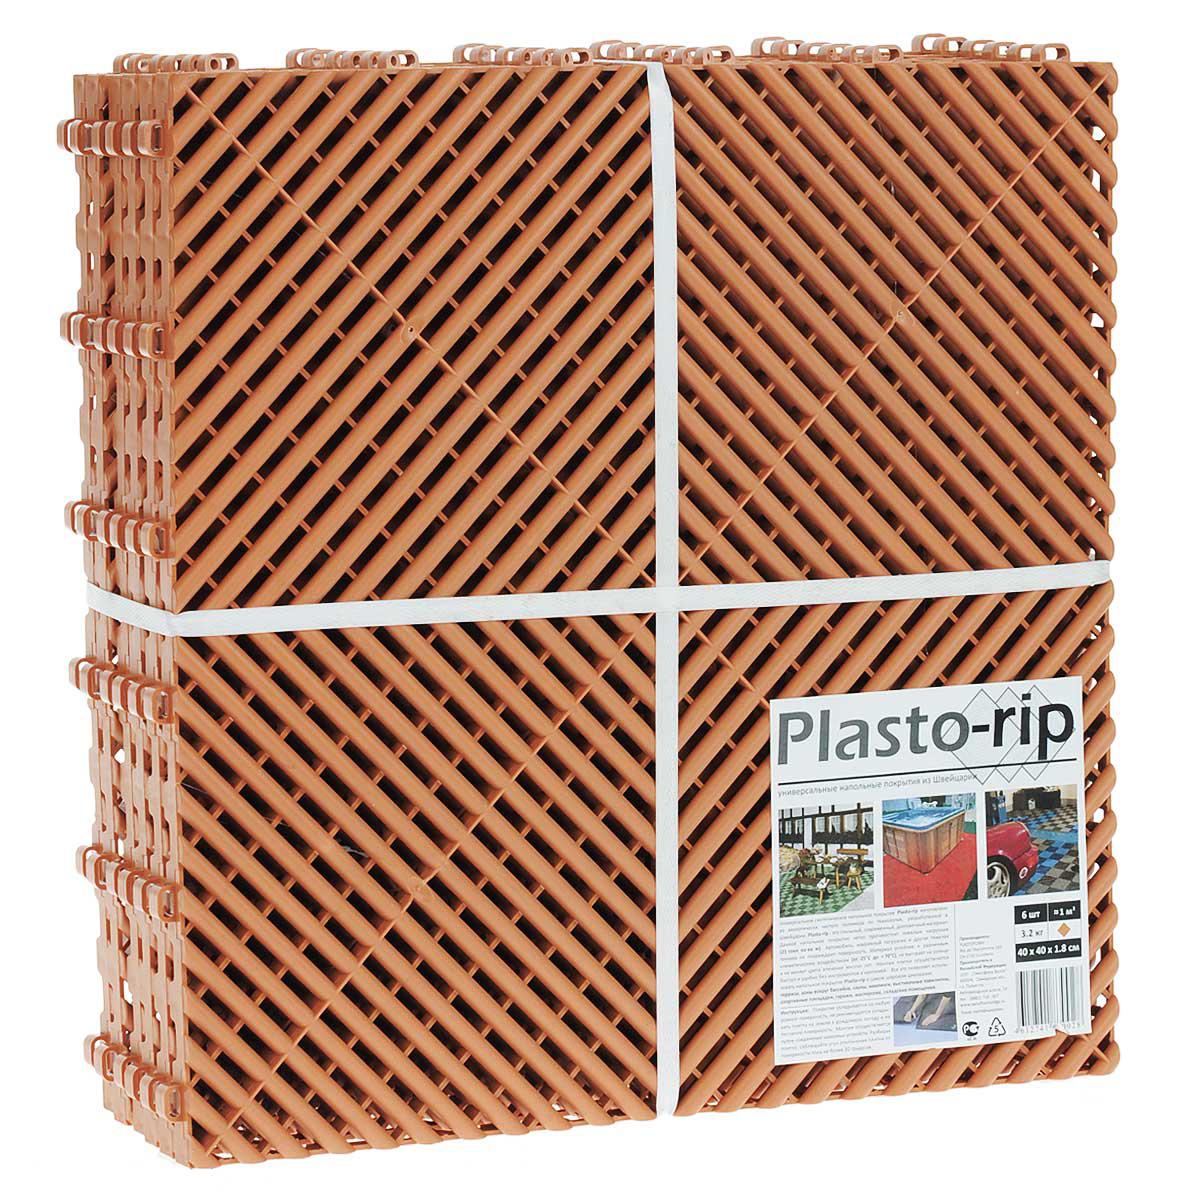 Плитка для пола Plasto Rip, цвет: терракотовый, 40 см х 40 см х 1,8 см, 6 шт